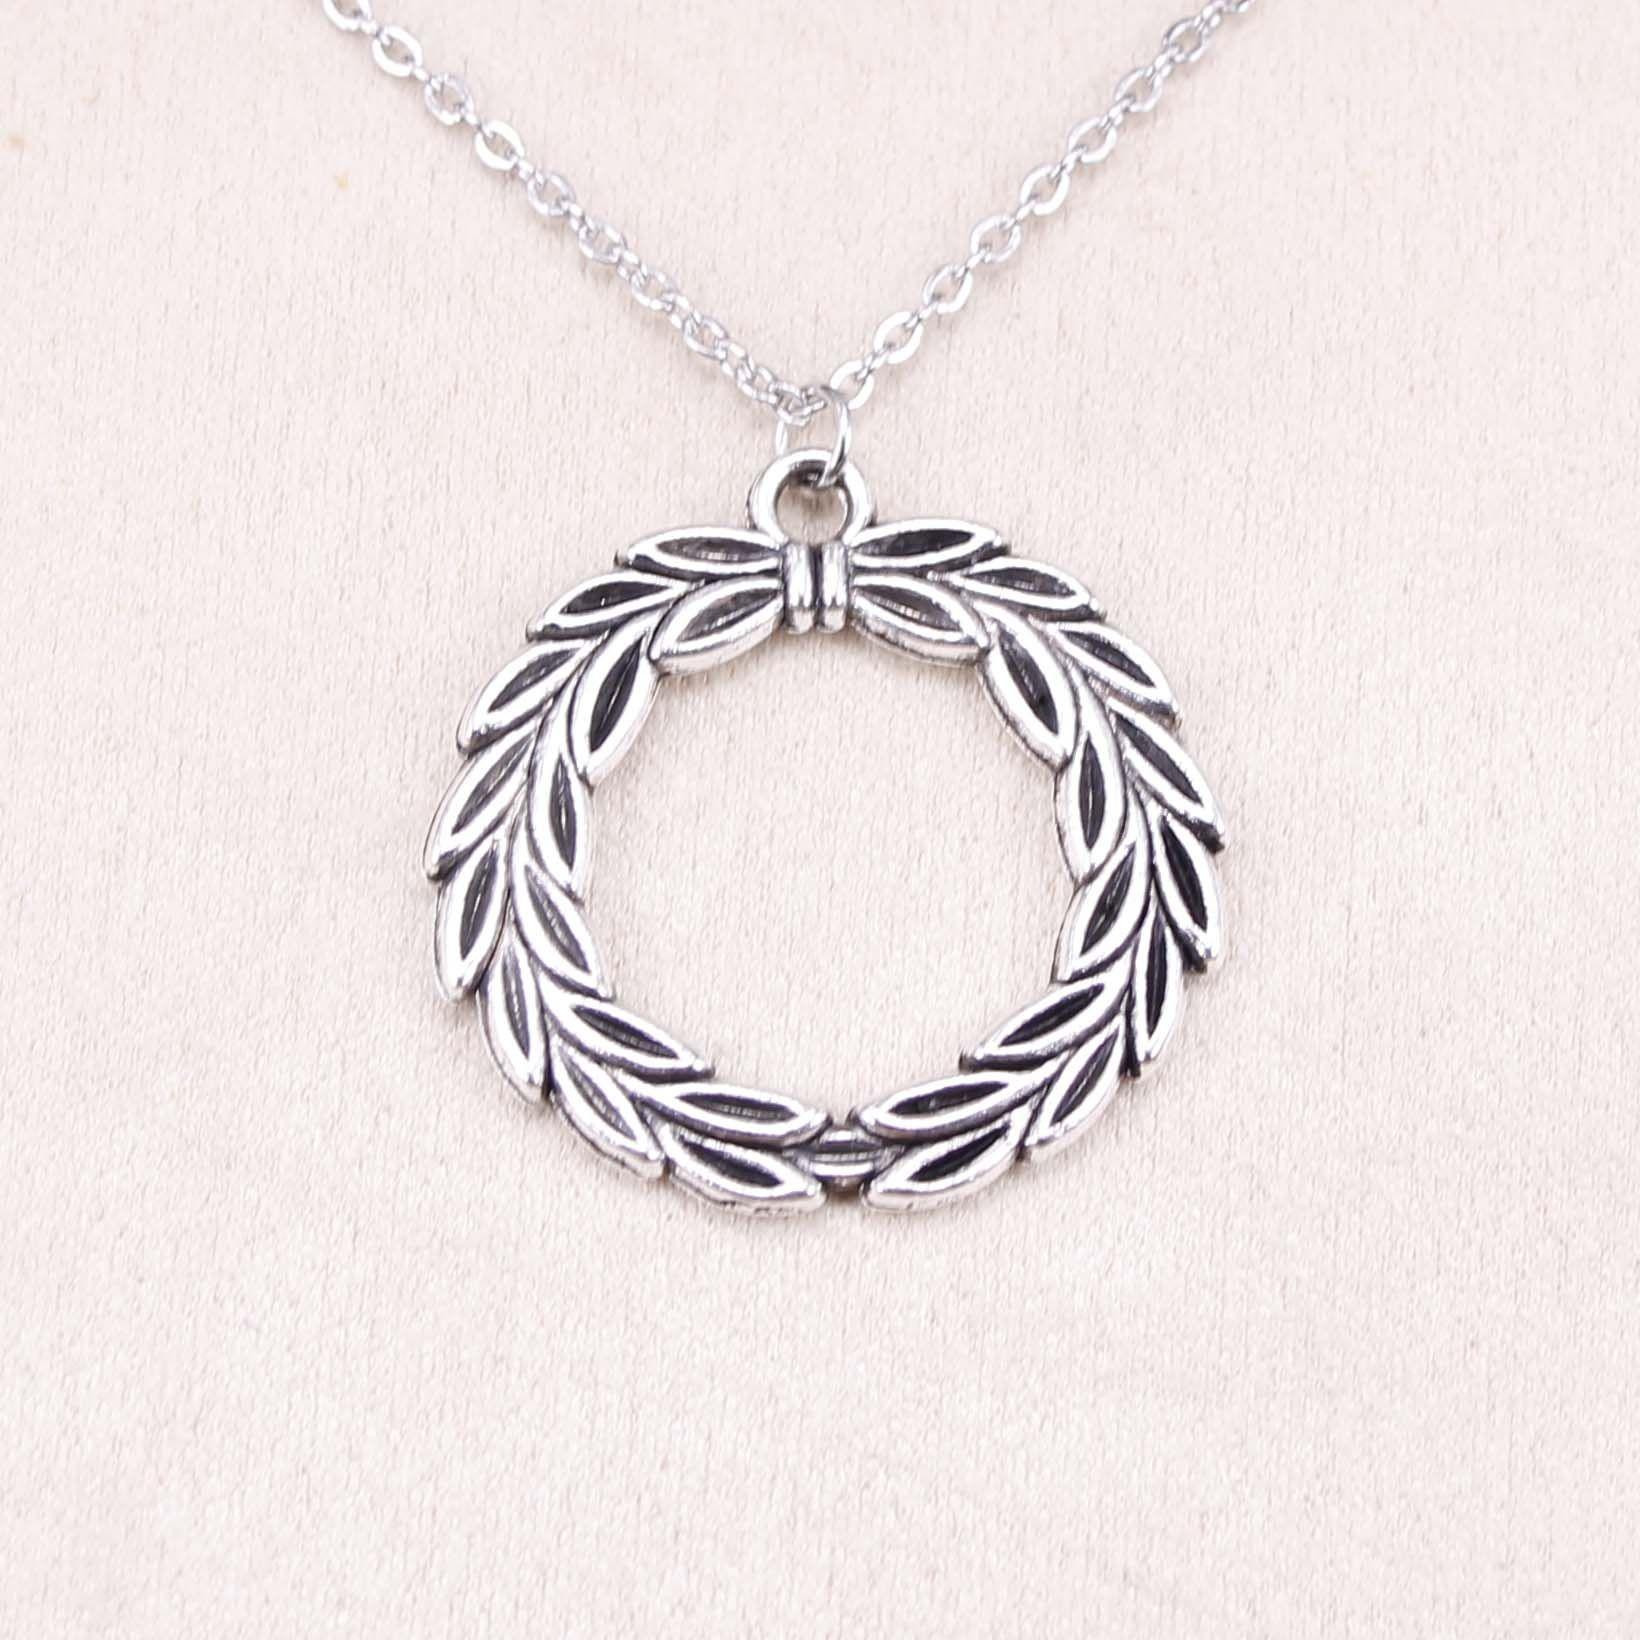 New Fashion Tibetan Silver Pendant olive branch laurel wreath 34mm Choker Charm Short Long DIY Necklace Factory Price Handmade Jewelry